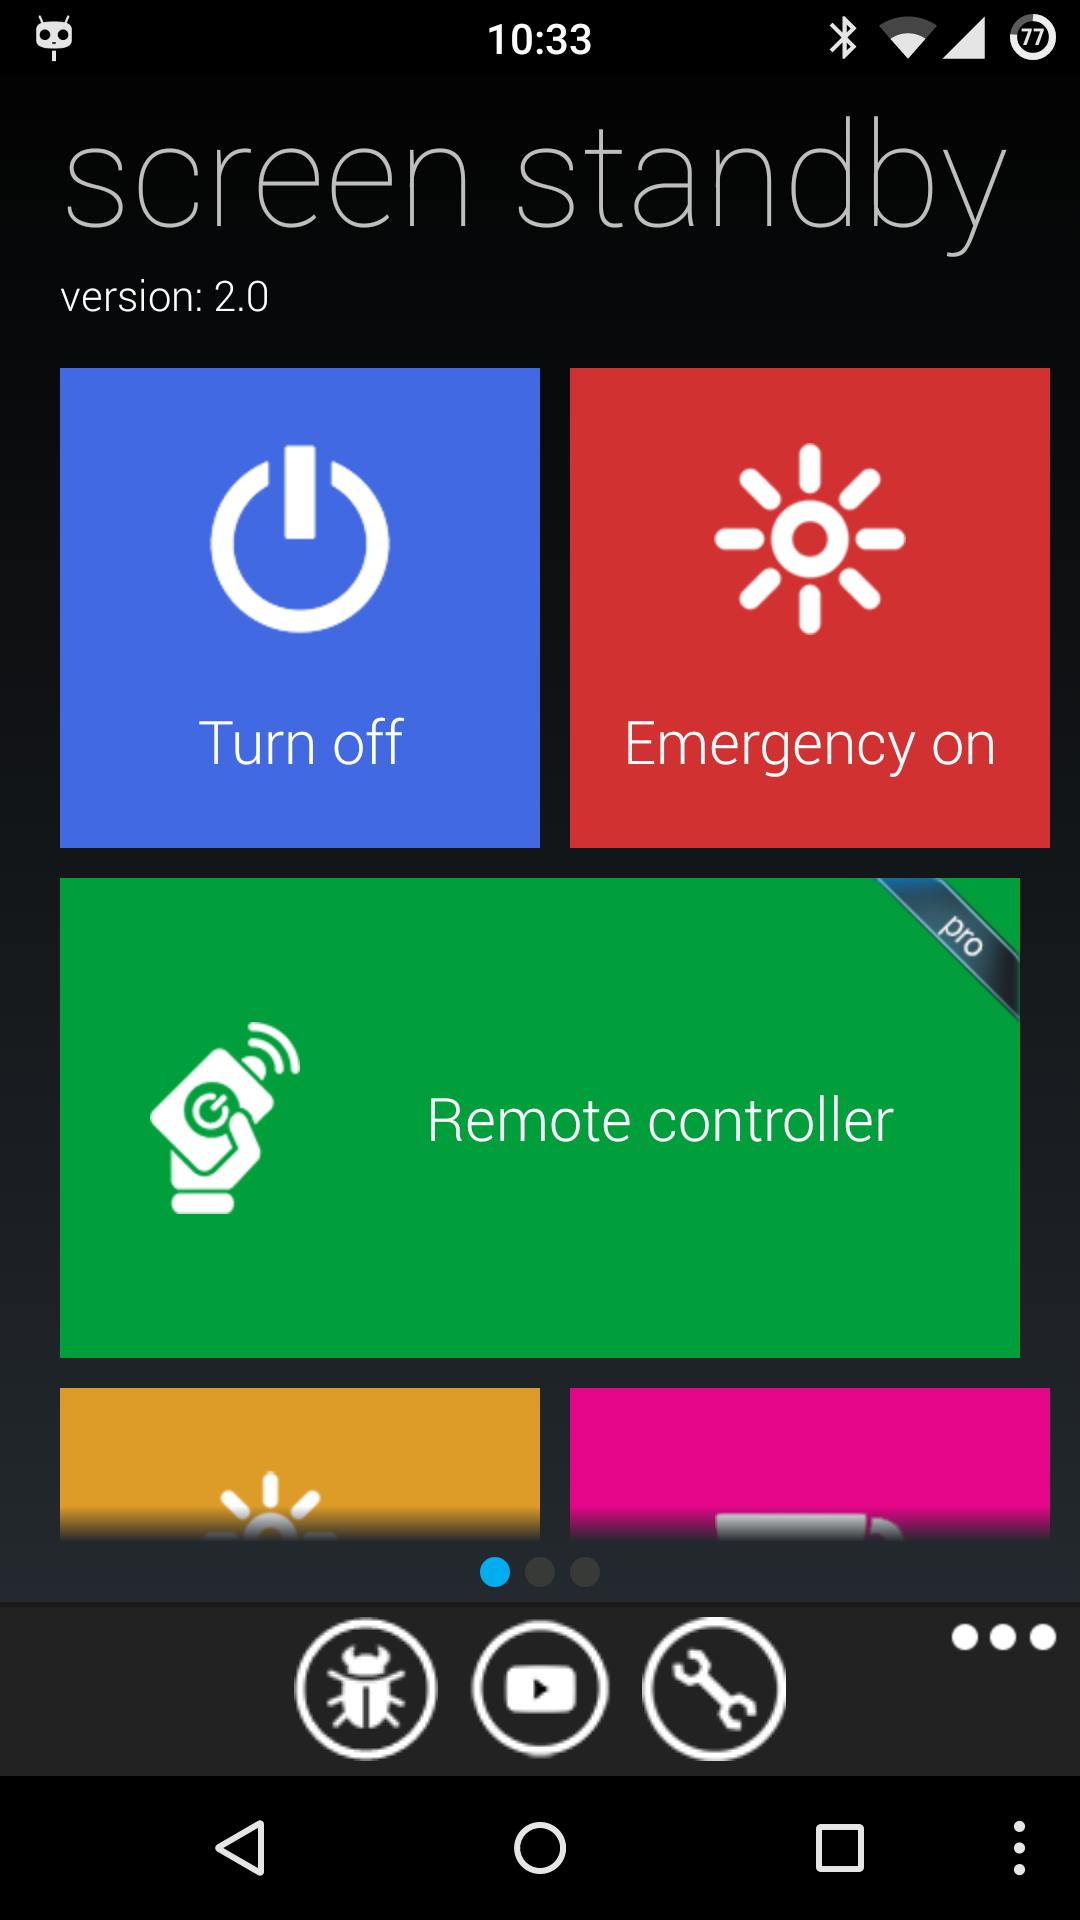 Screen Standby с интерфейсом в стиле Metro